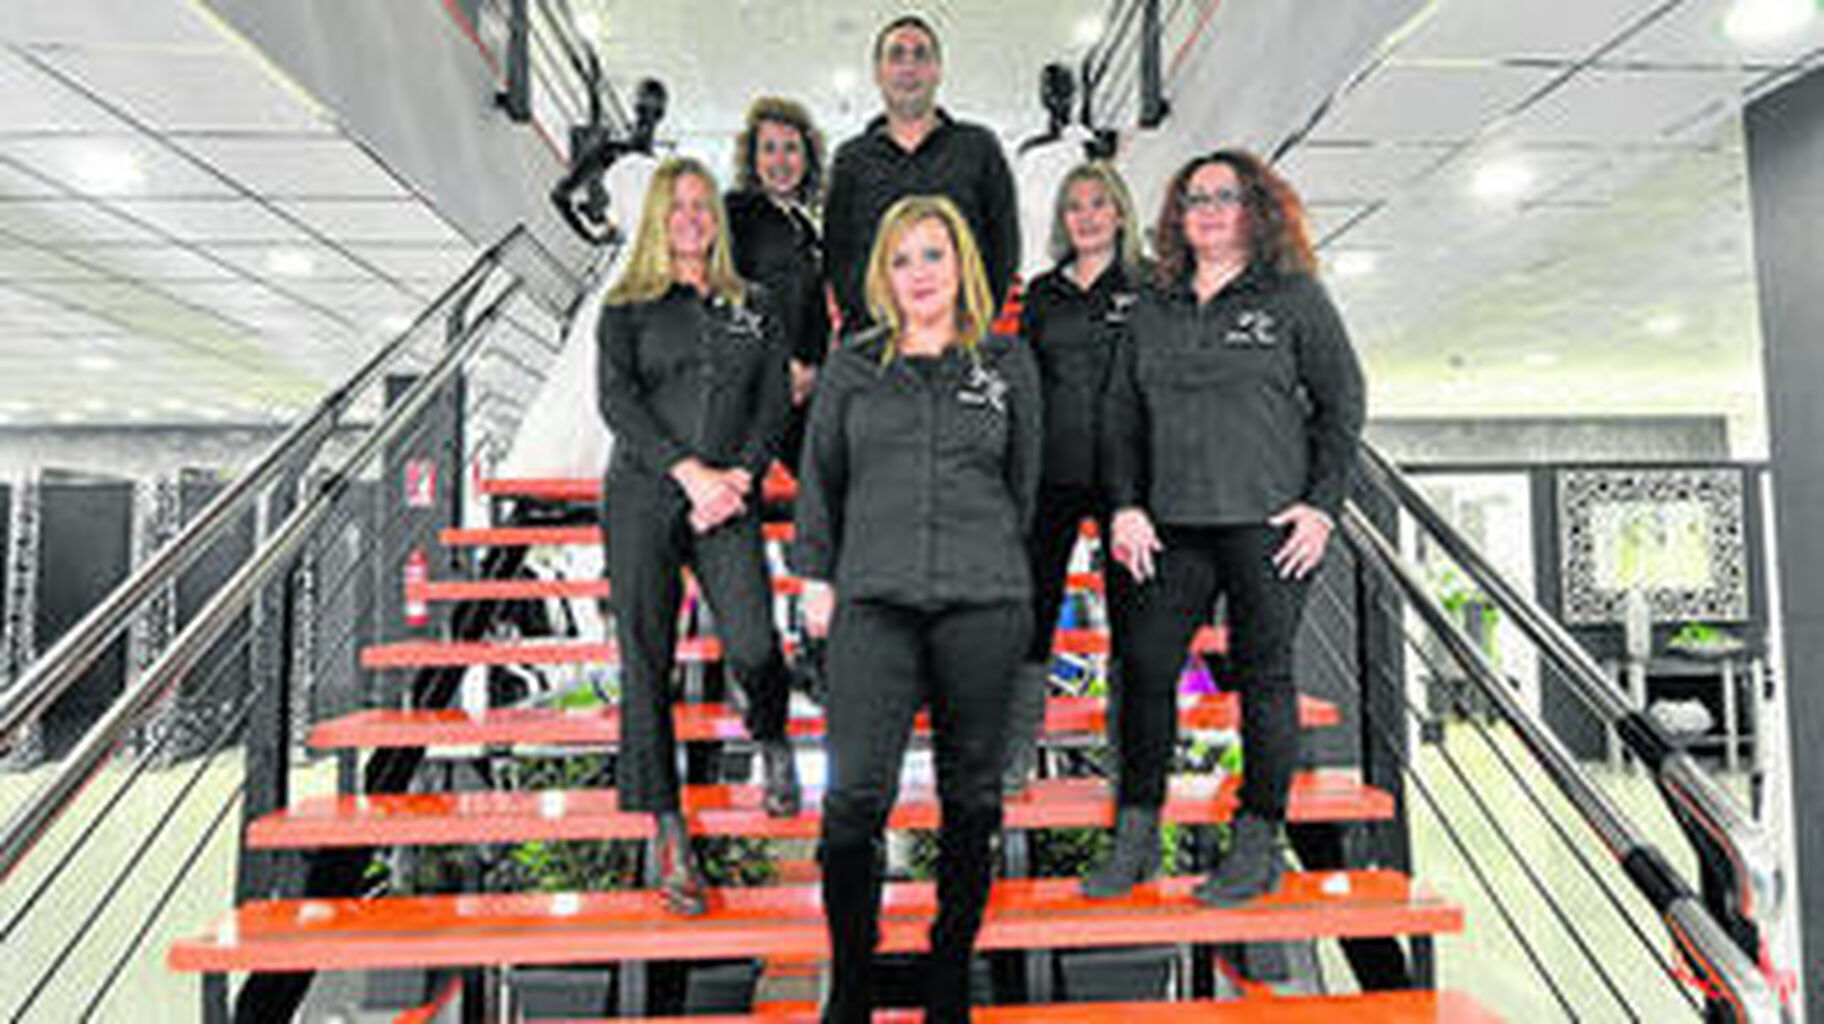 Factory vertize gala vestidos de fiesta